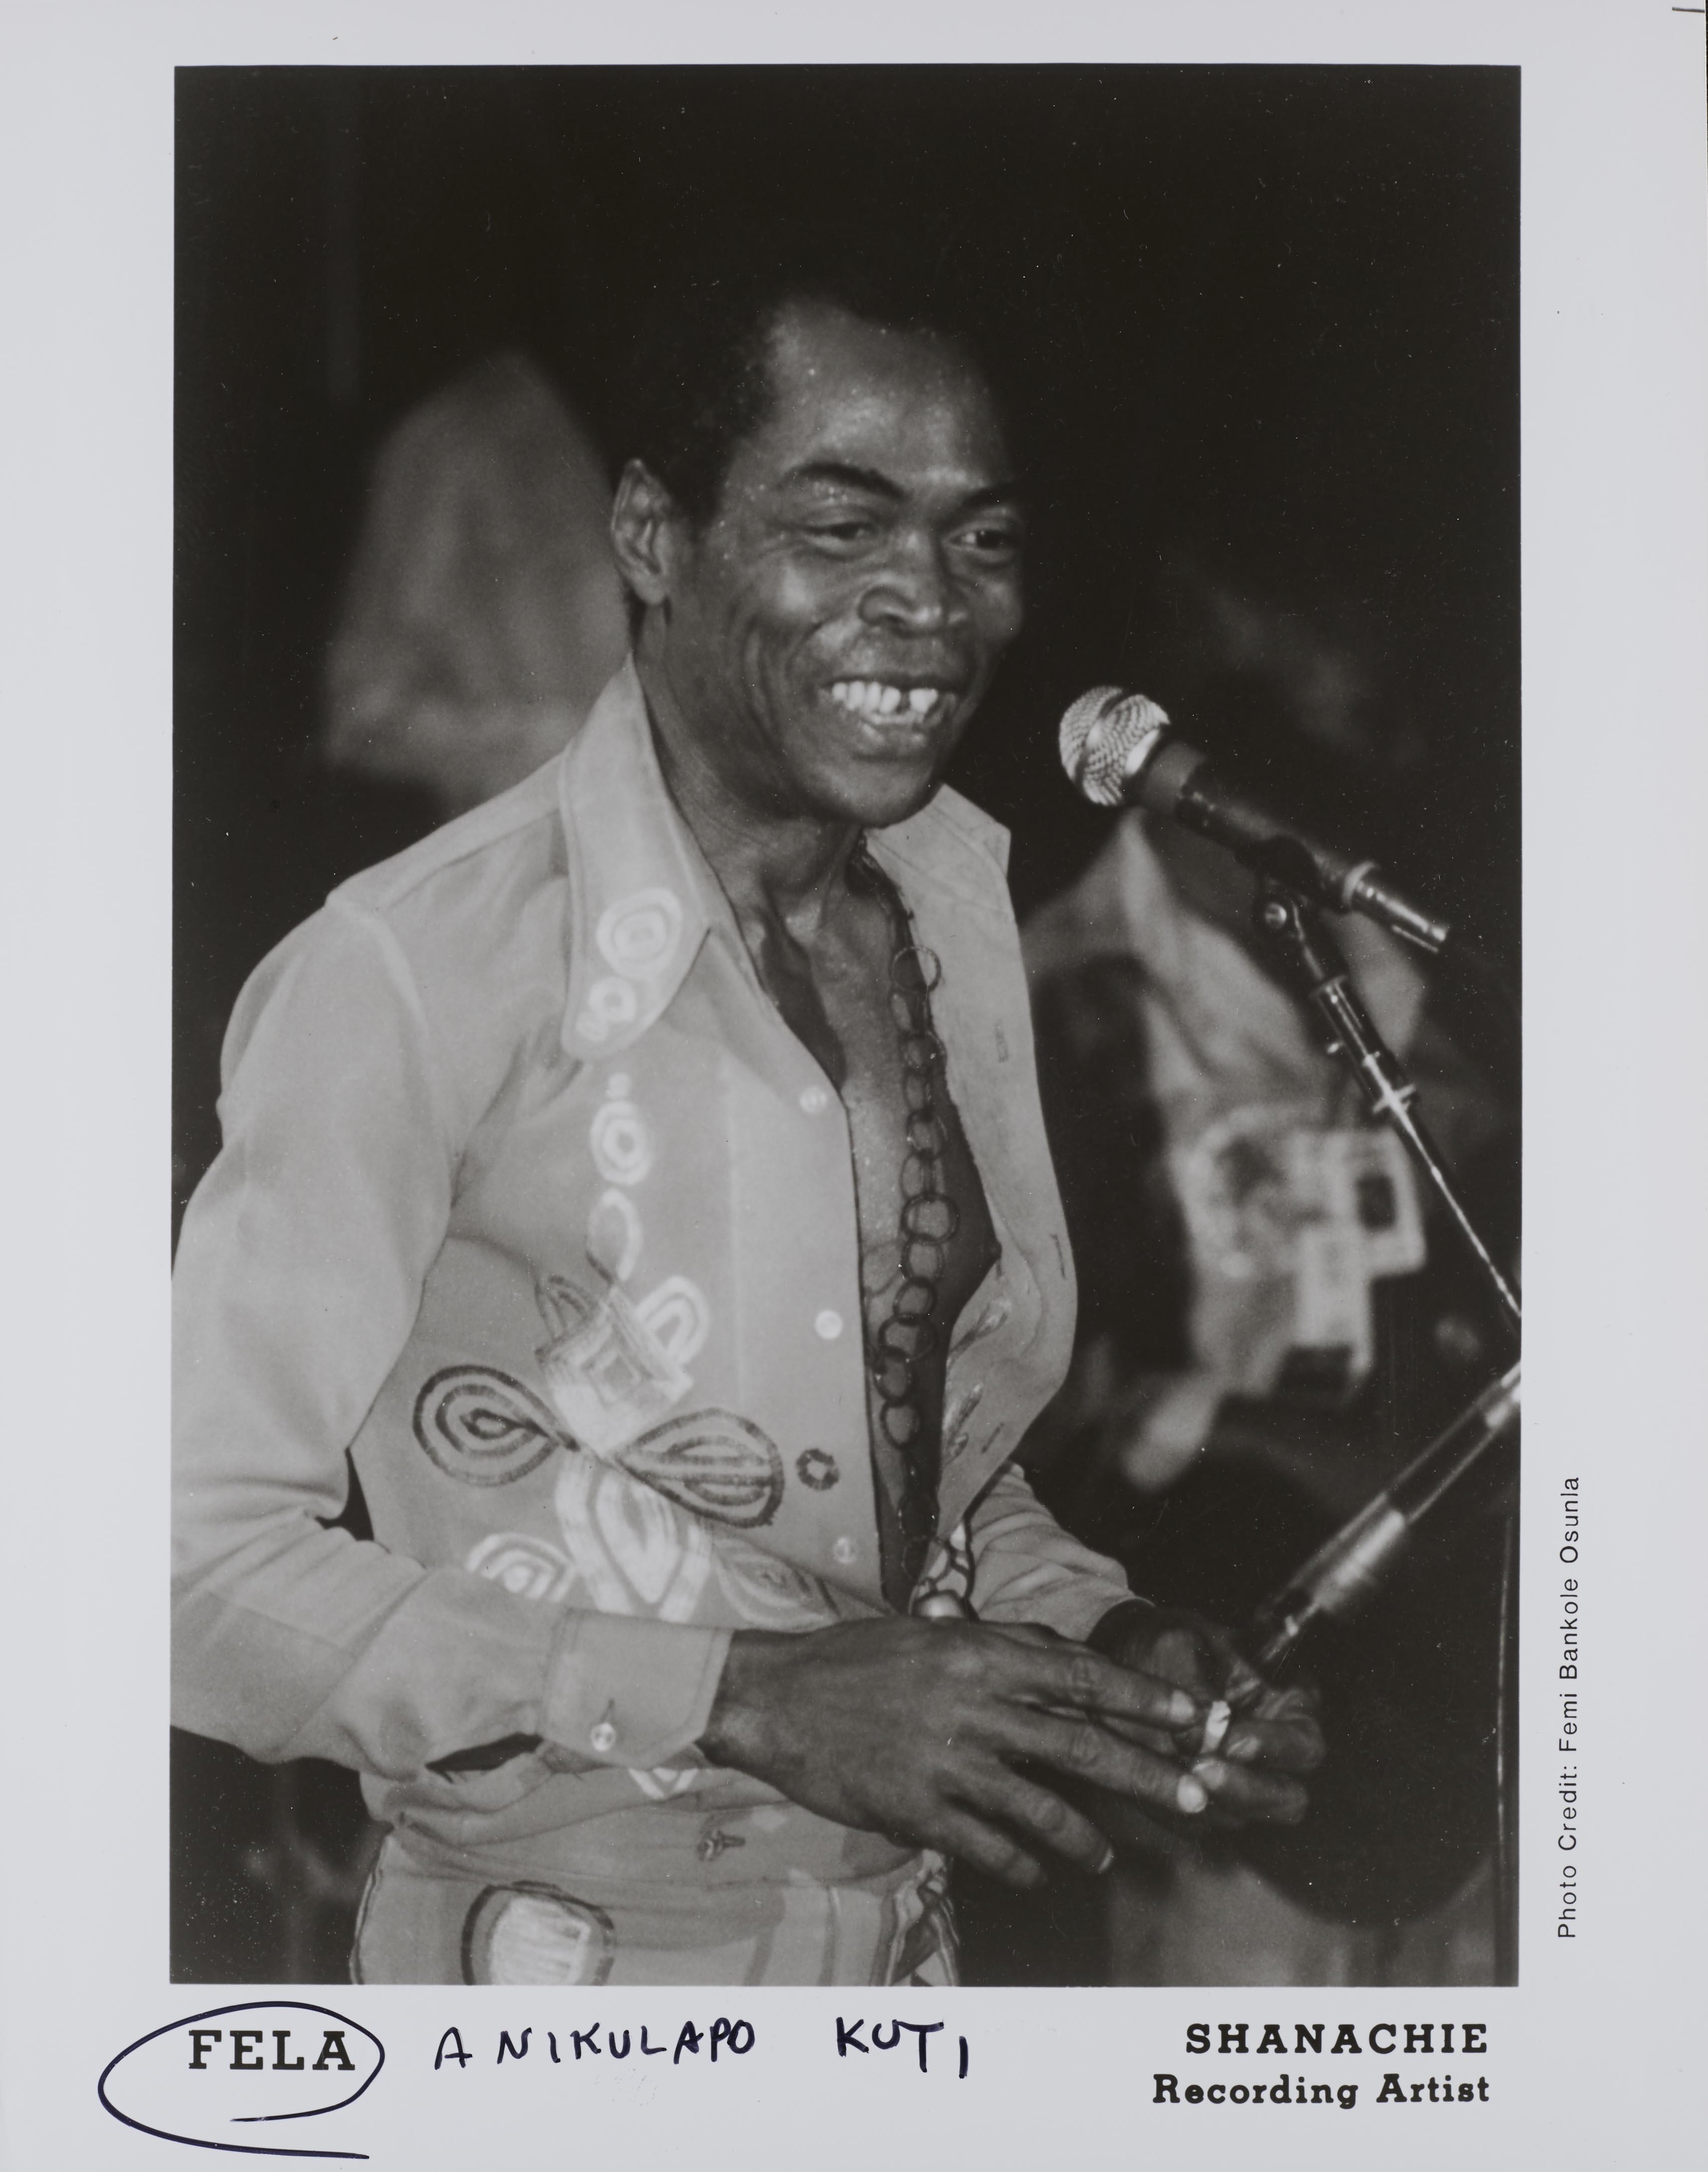 Fela Kuti promo photo